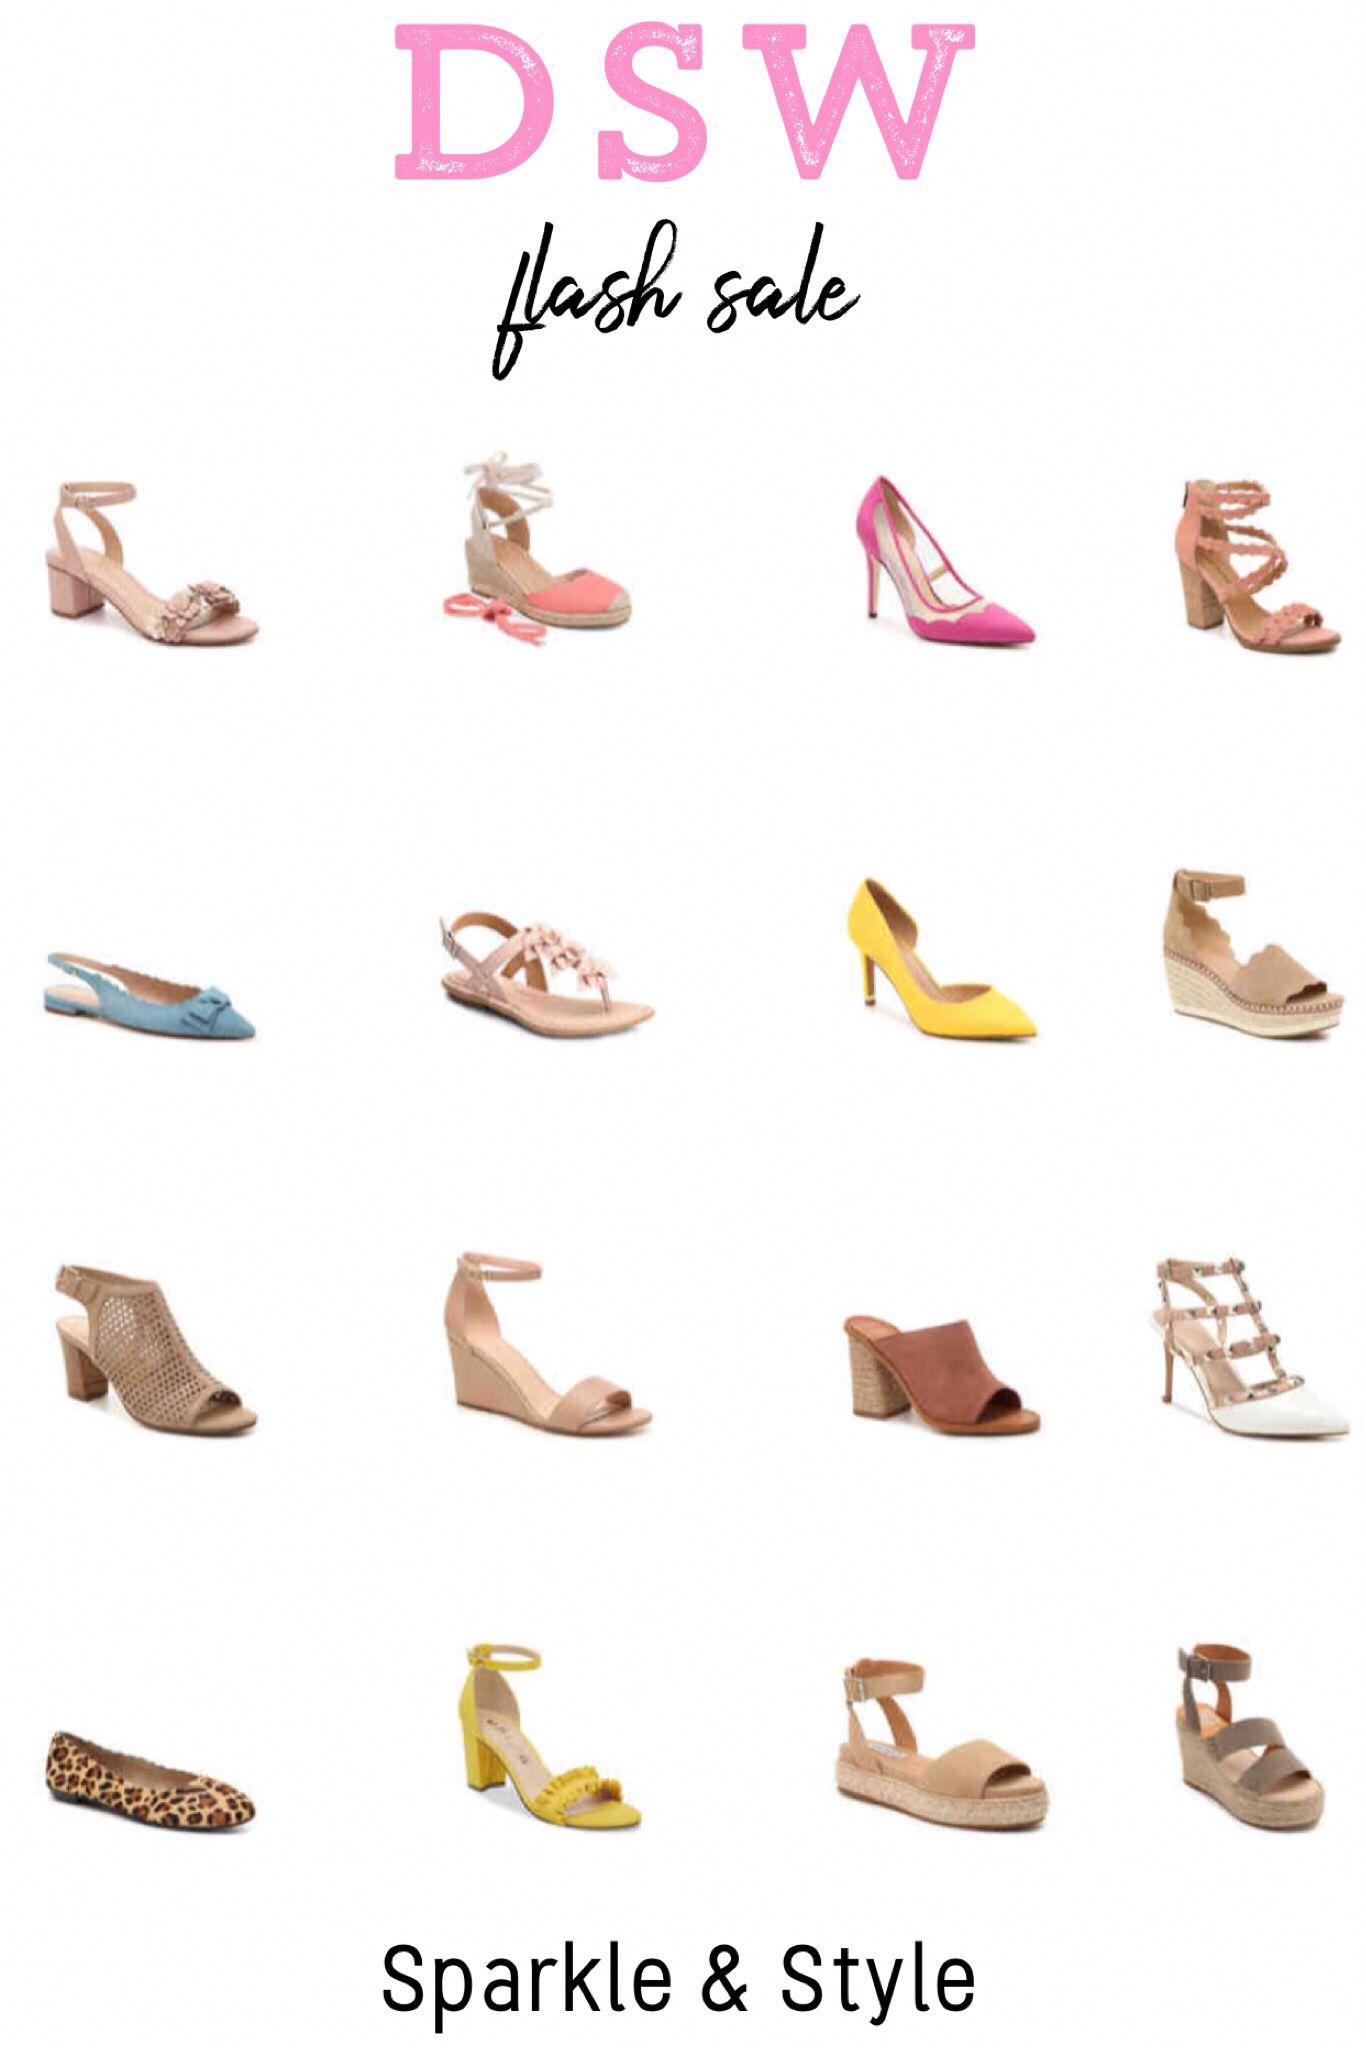 DSW Spring Shoes - Sparkle \u0026 Style